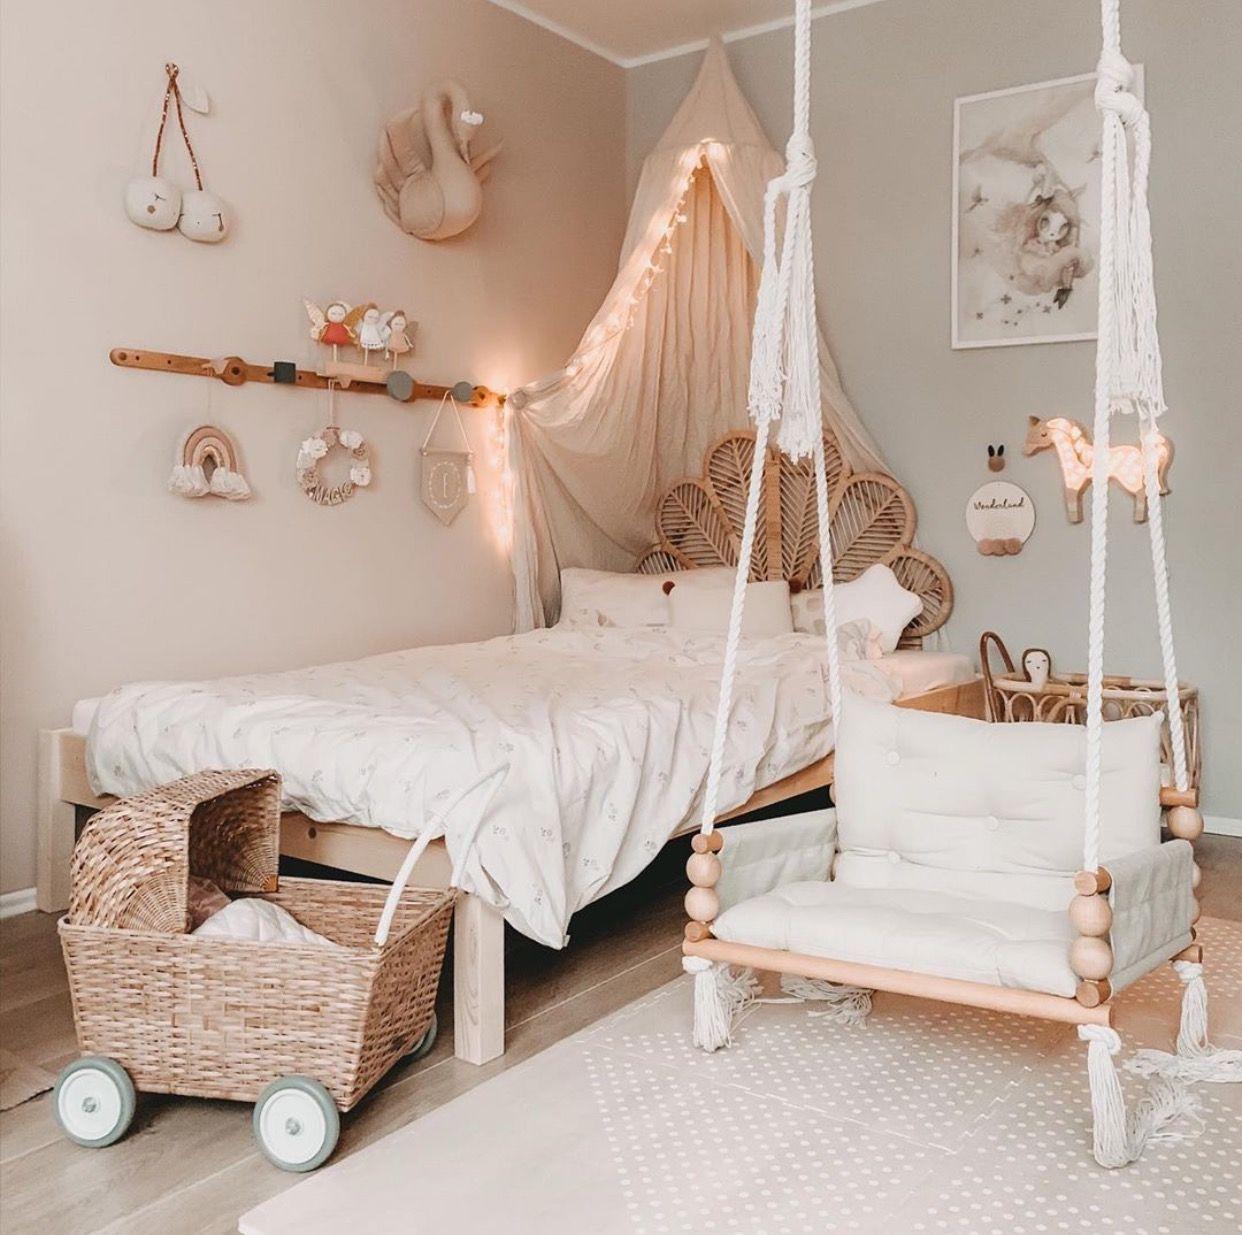 Kid's room Olli Ella Strolley Basket in 2020 Toddler